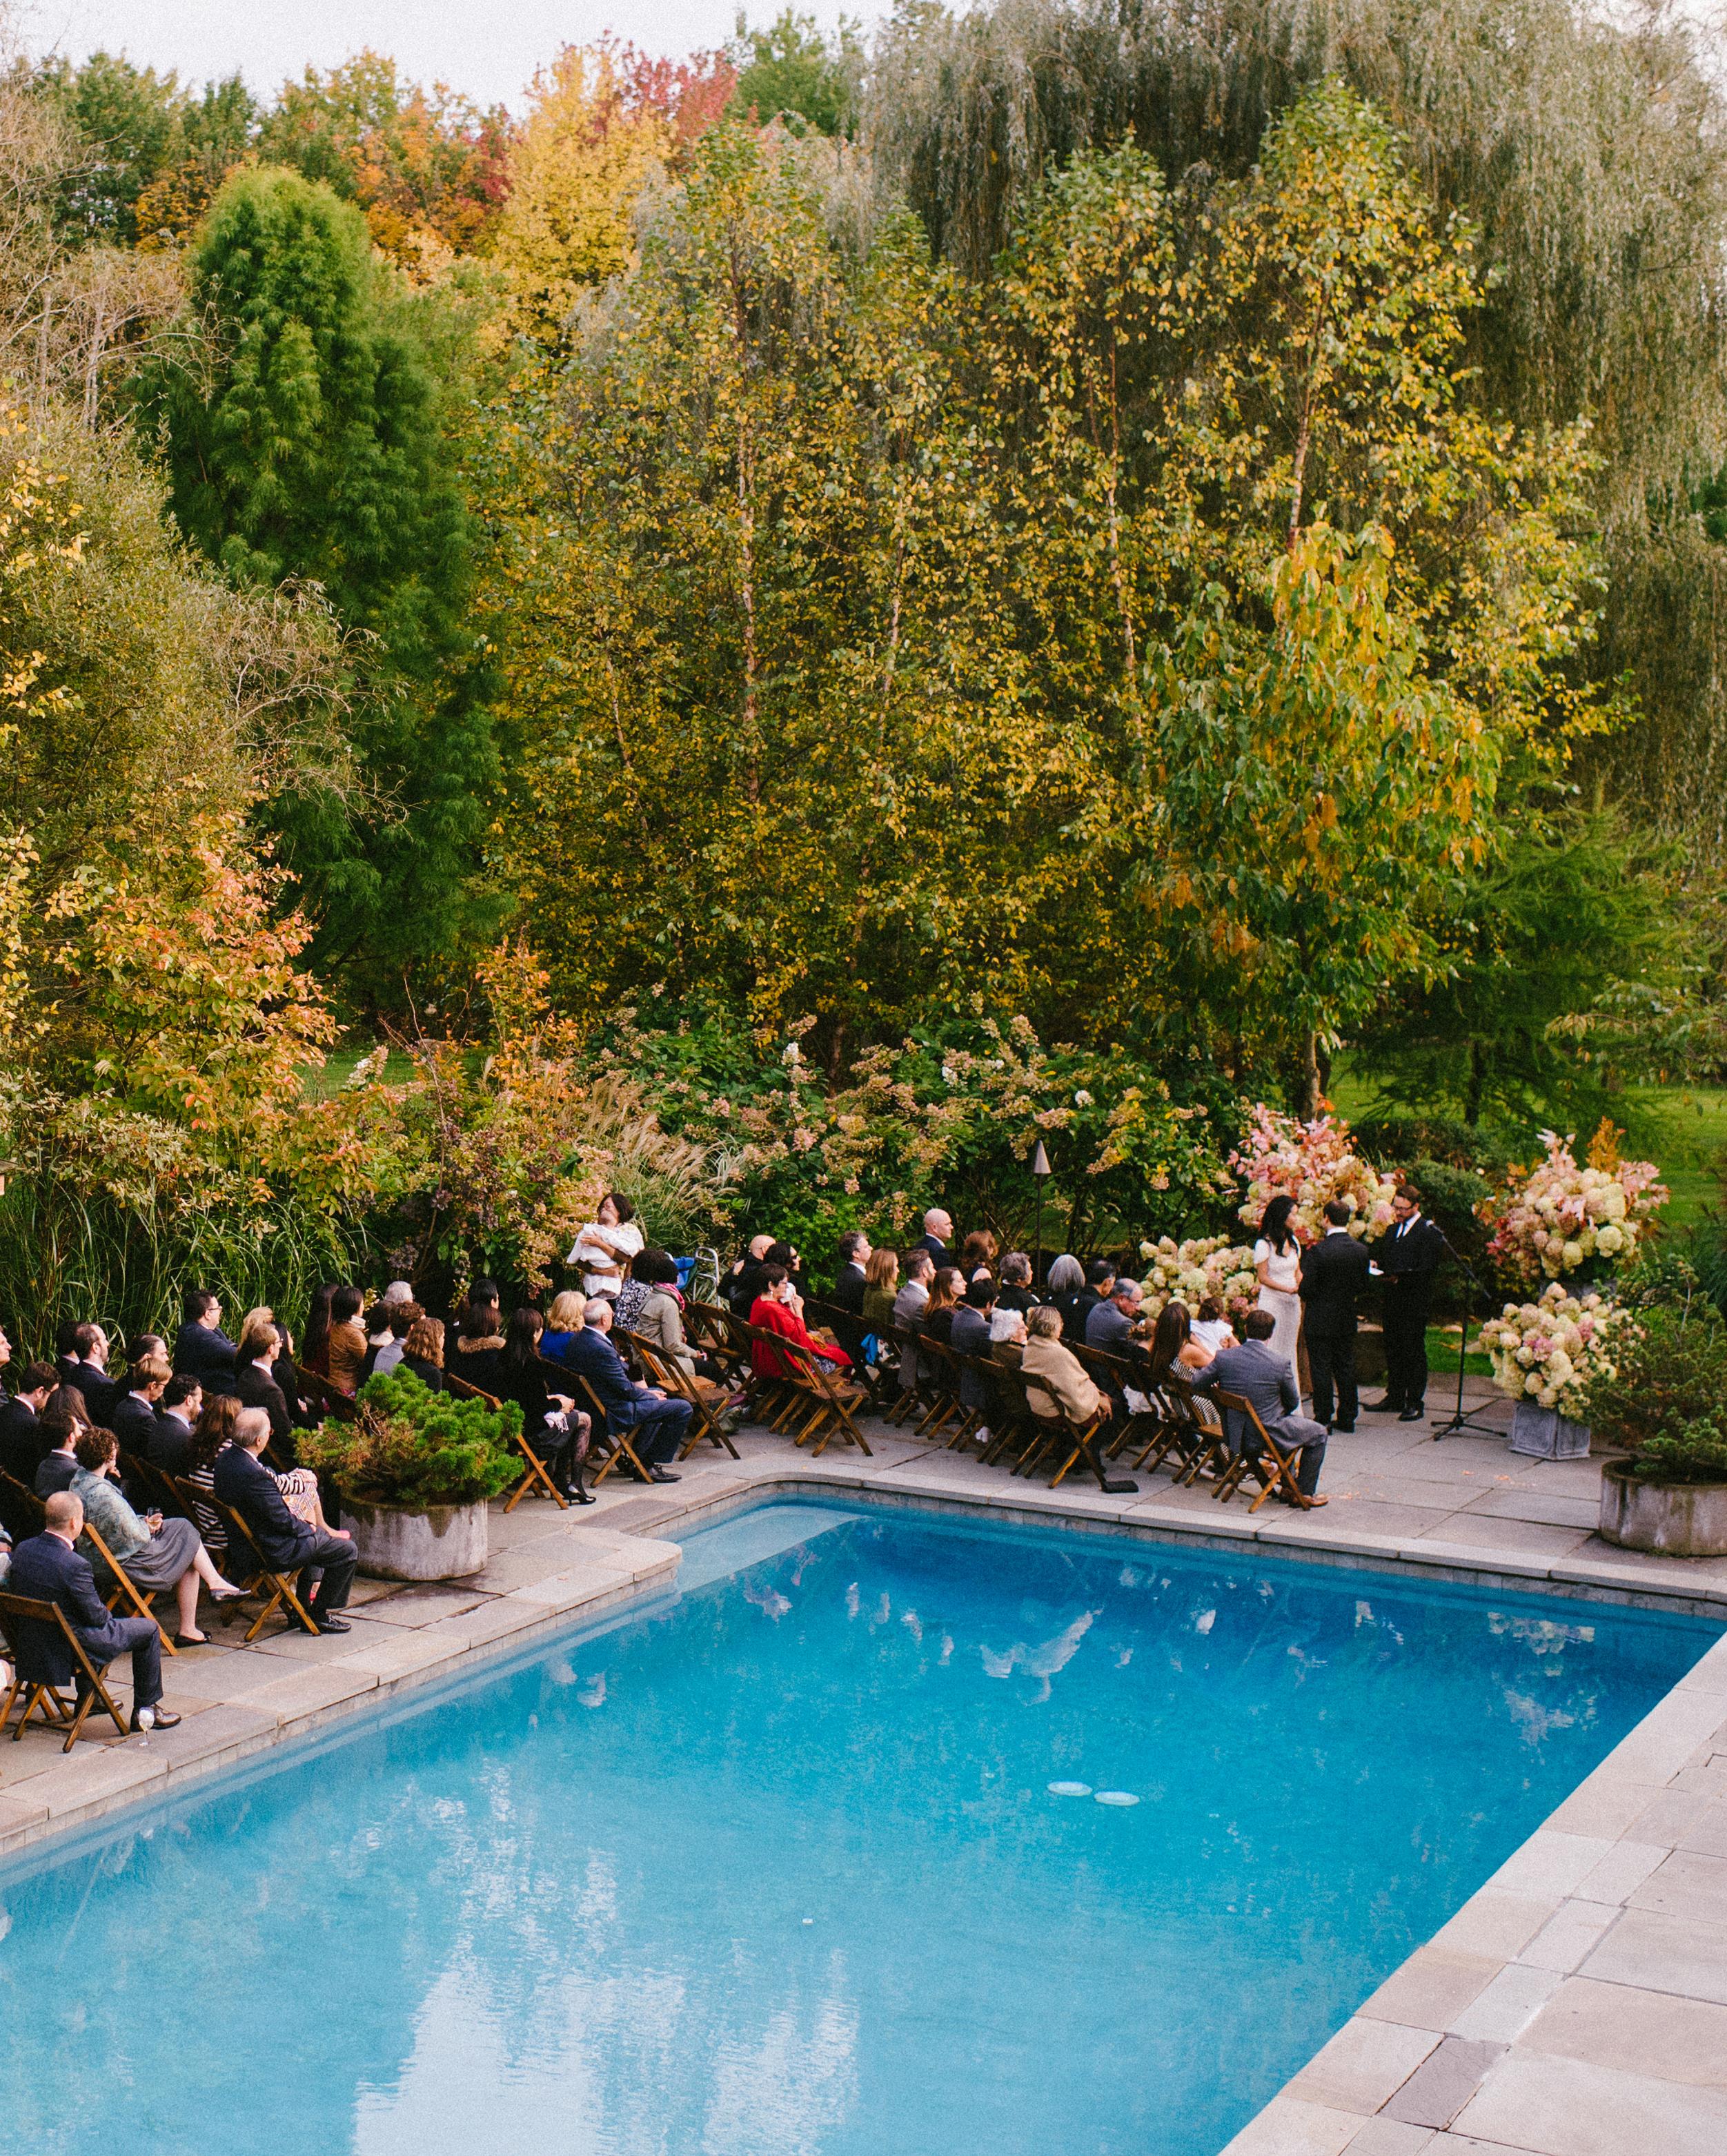 maki-rick-wedding-ceremony-0391-s112096-0815.jpg